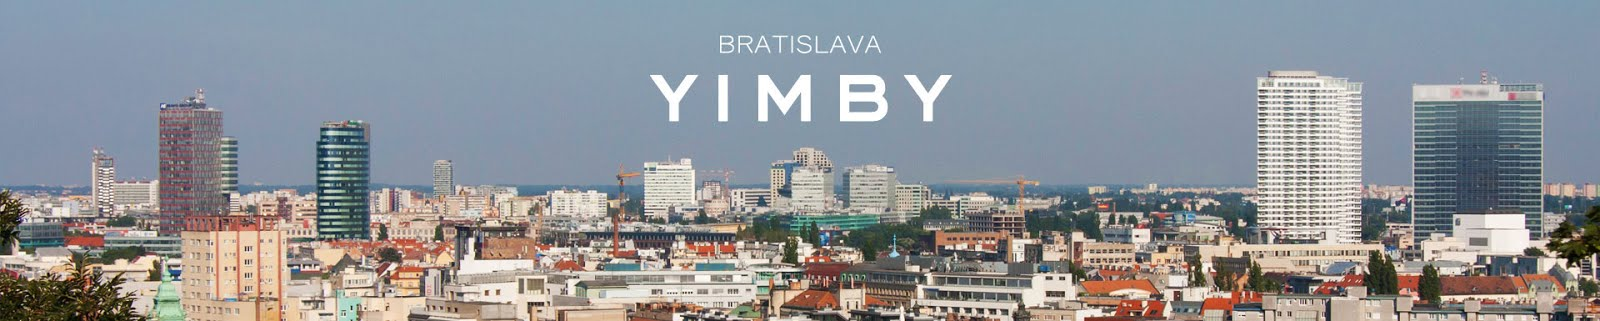 Bratislava YIMBY